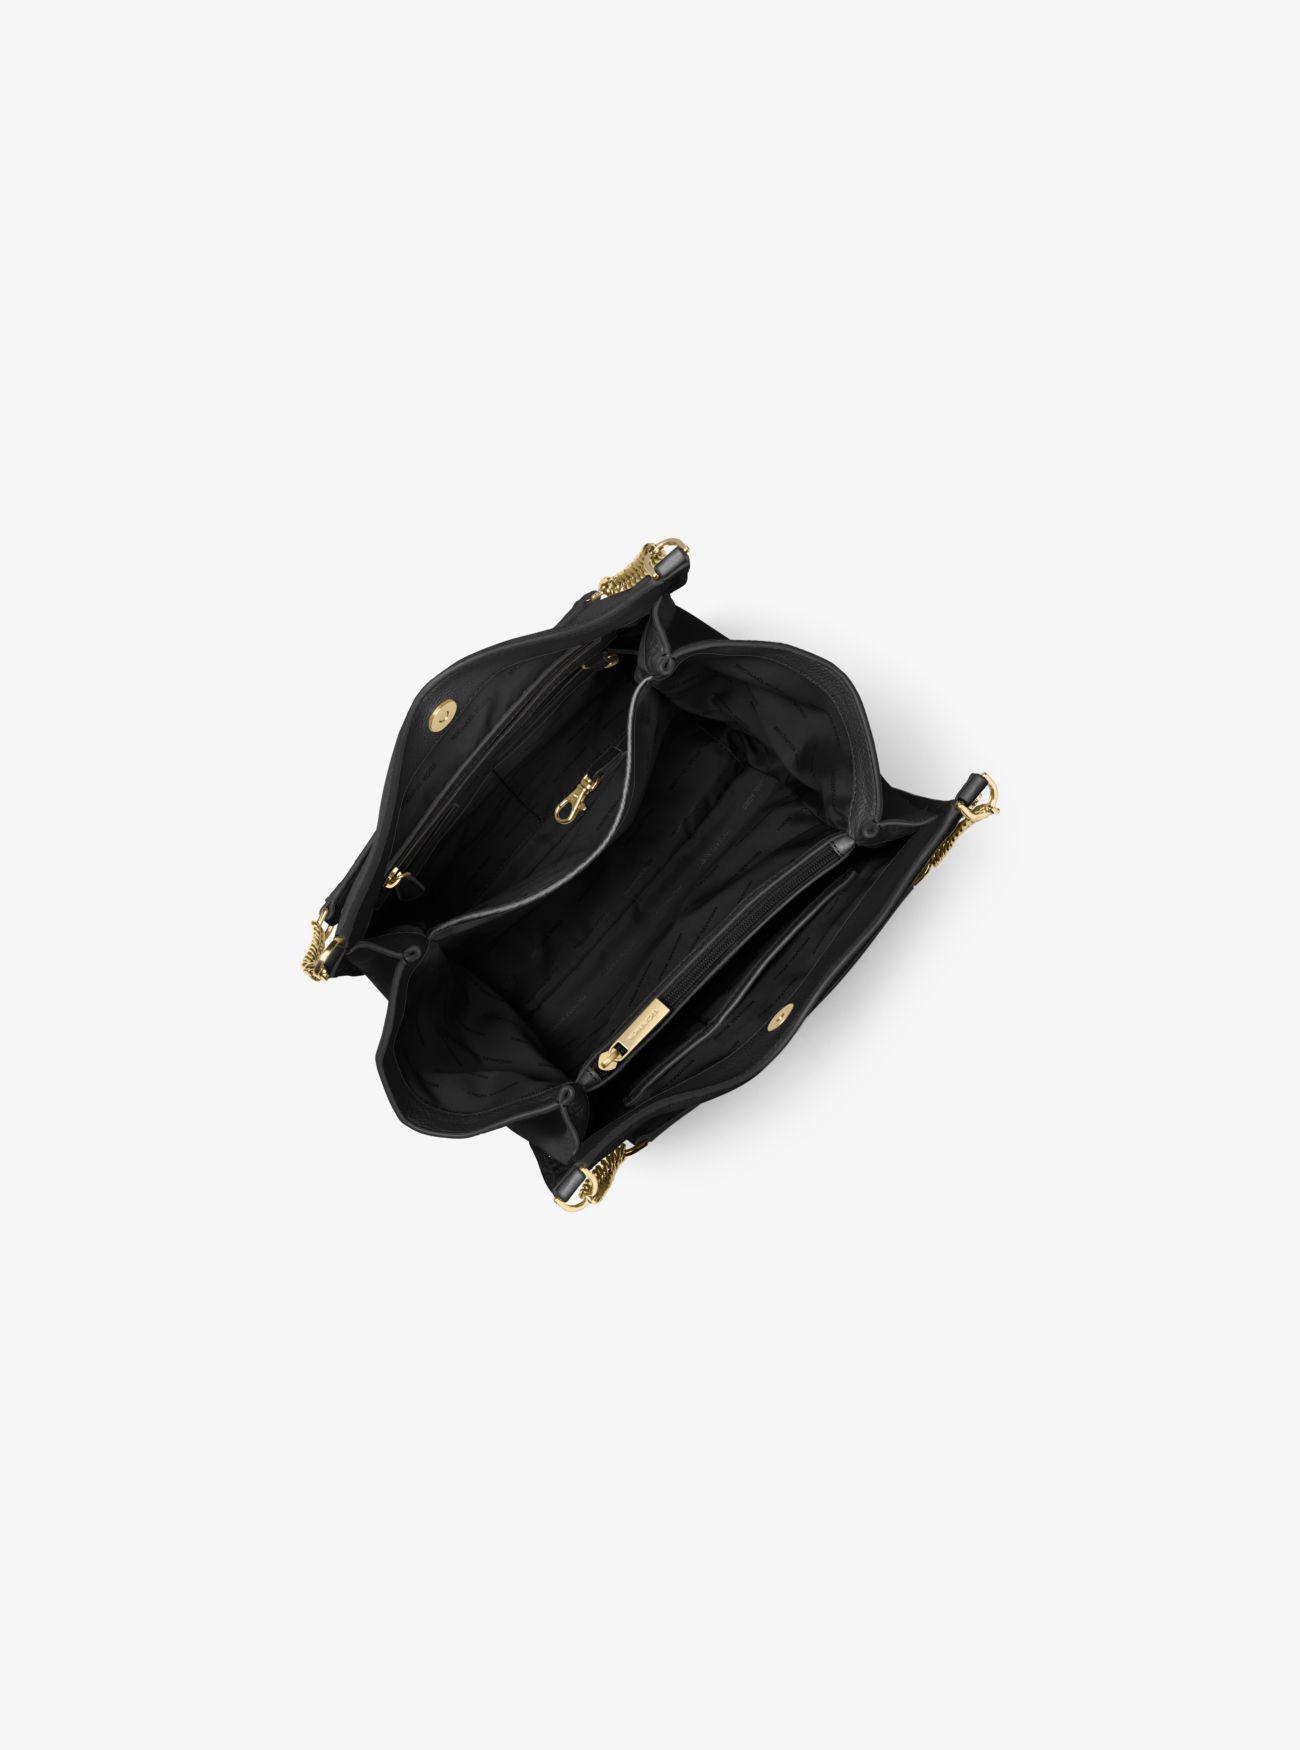 3b20037f68c Lyst - Michael Kors Newbury Studded Leather Chain Tote Bag in Black